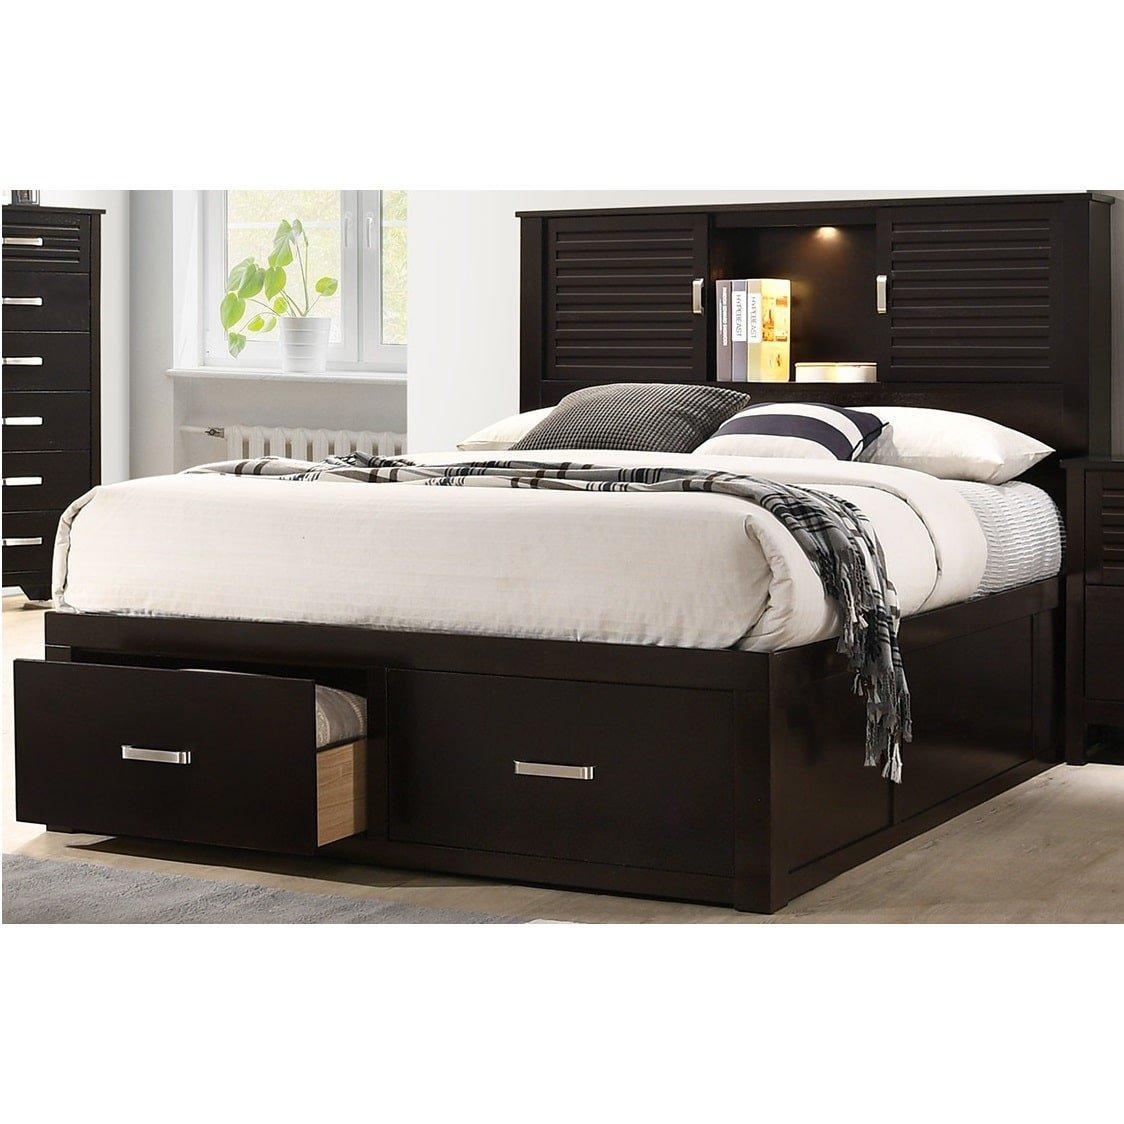 5 piece dalton queen bed only w woodhaven pillow top plush mattress